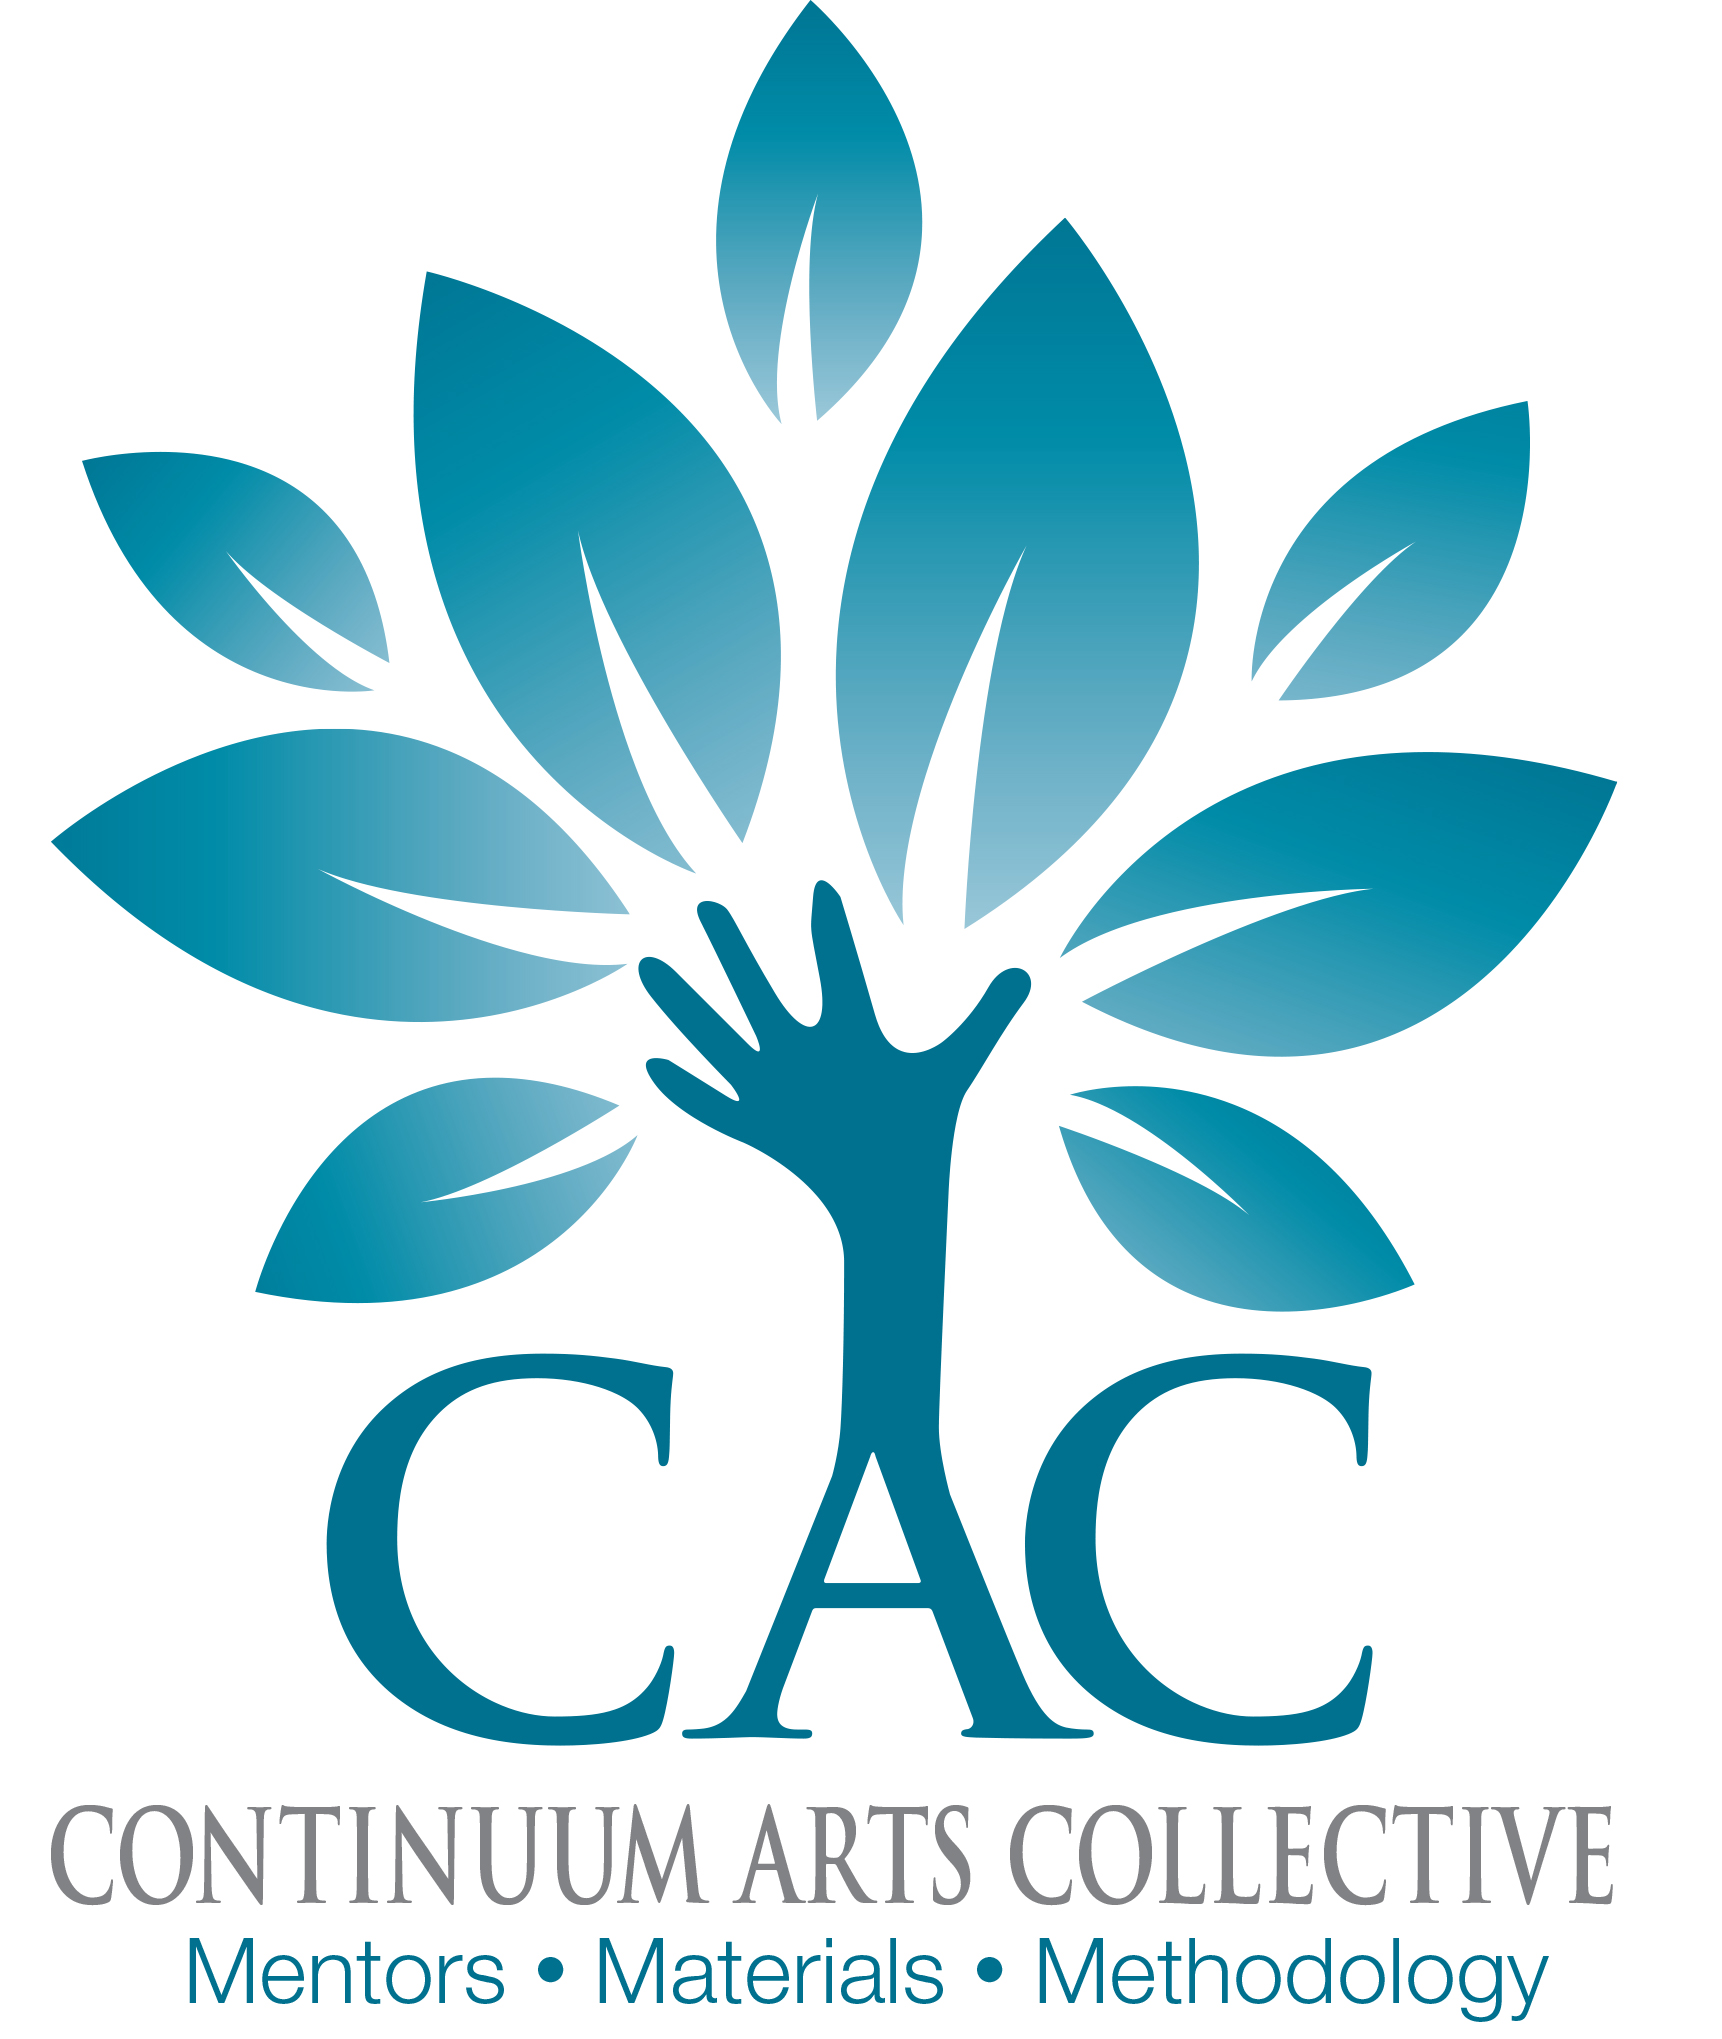 cac_logo_final.jpg